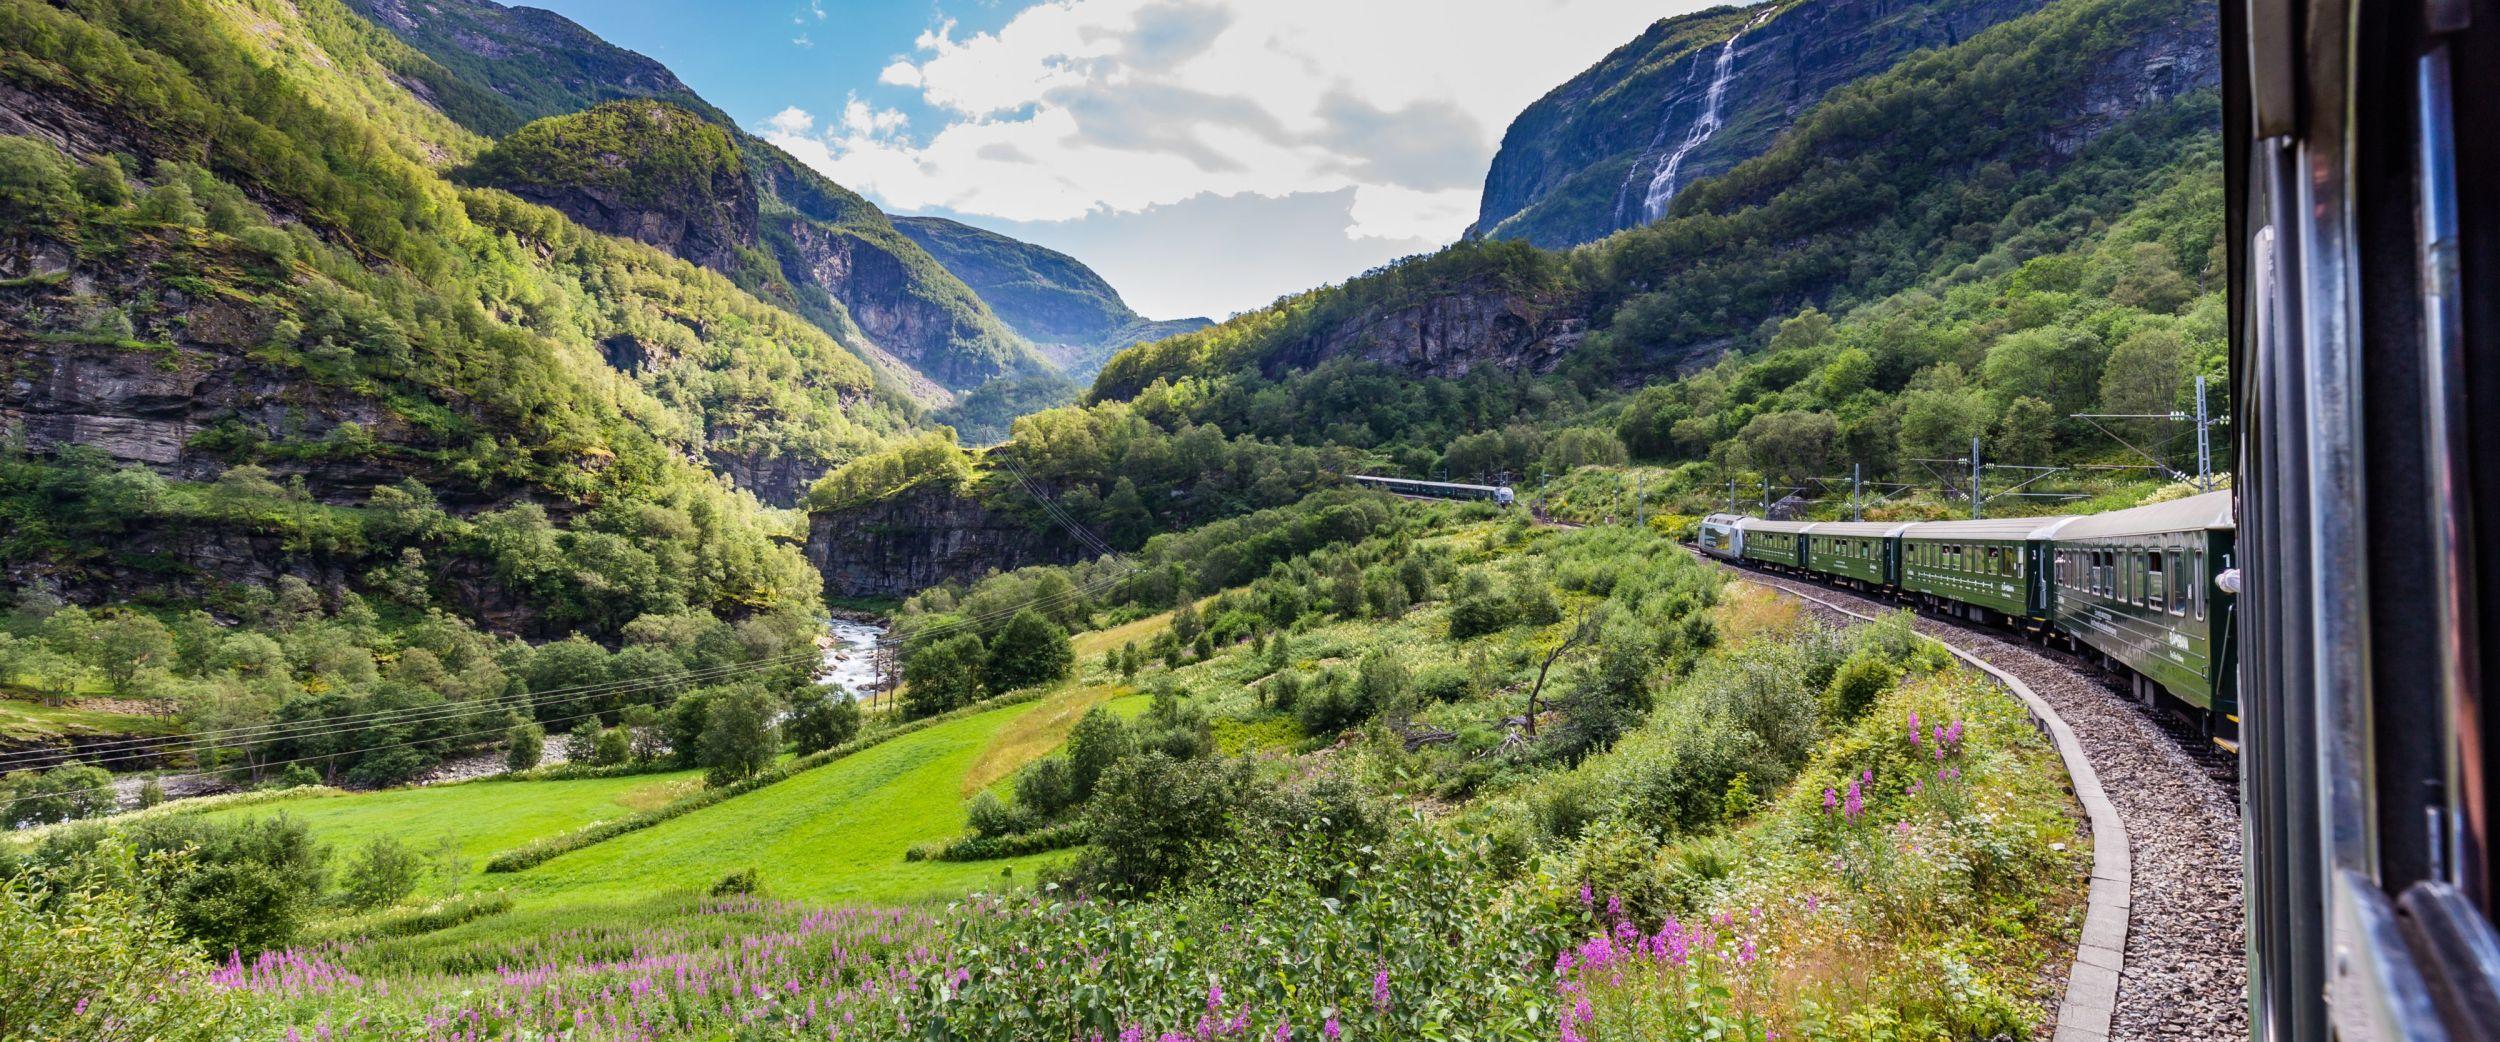 Train in beautifull surroundings, Norway in a Nutshell.